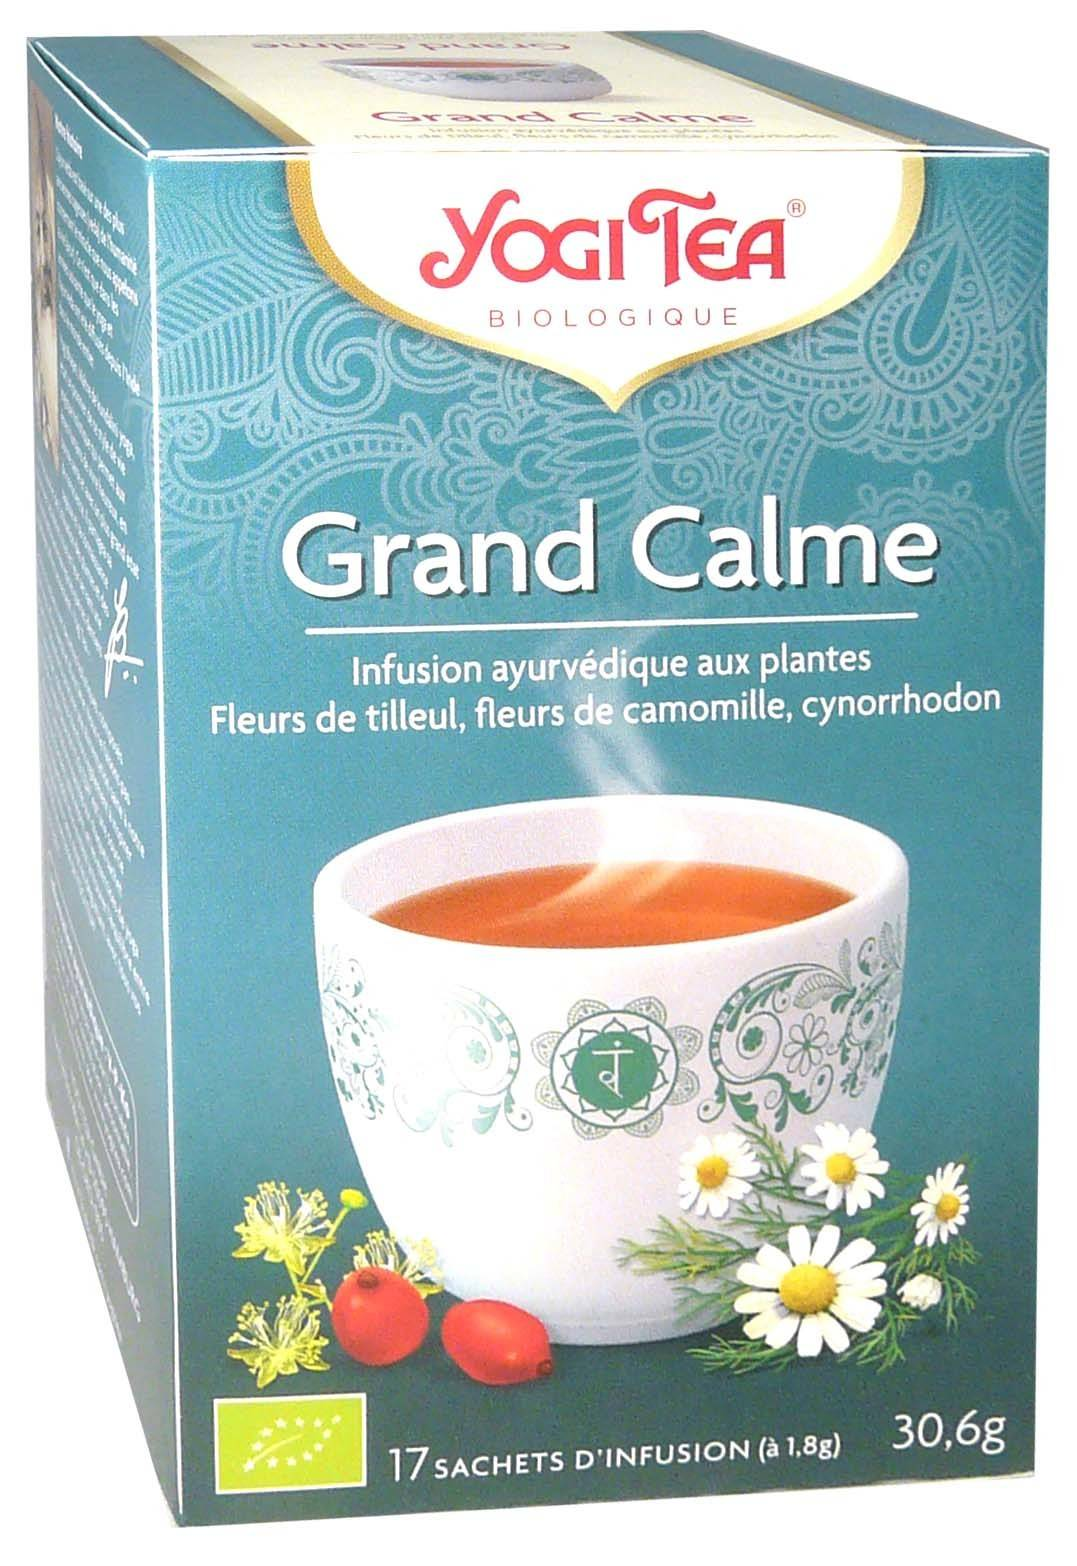 Yogi tea infusion grand calme x17 sachets